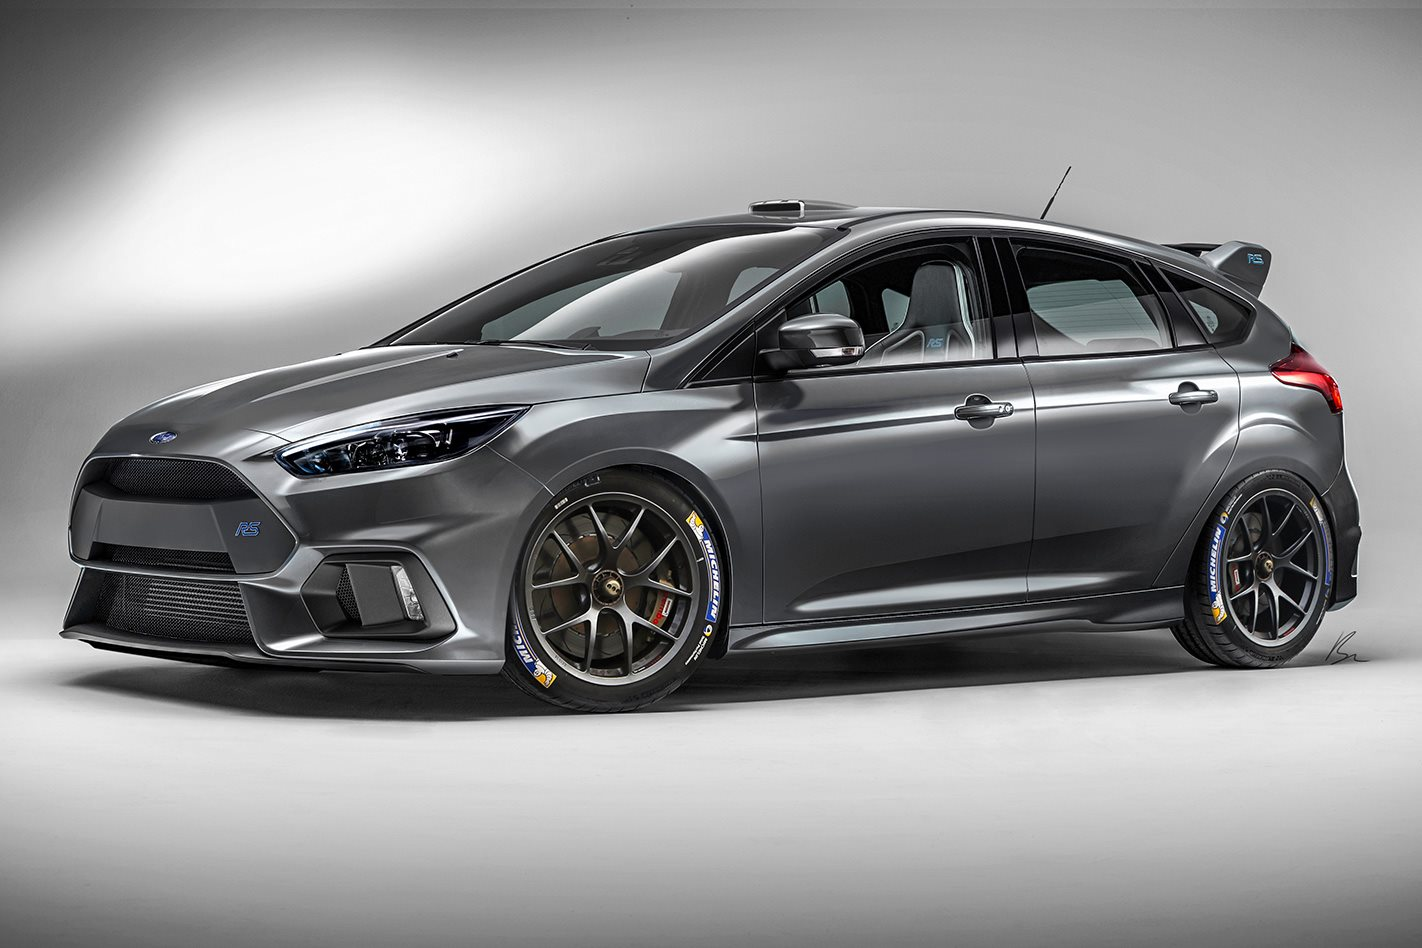 2017-Ford-Focus-RS.jpg